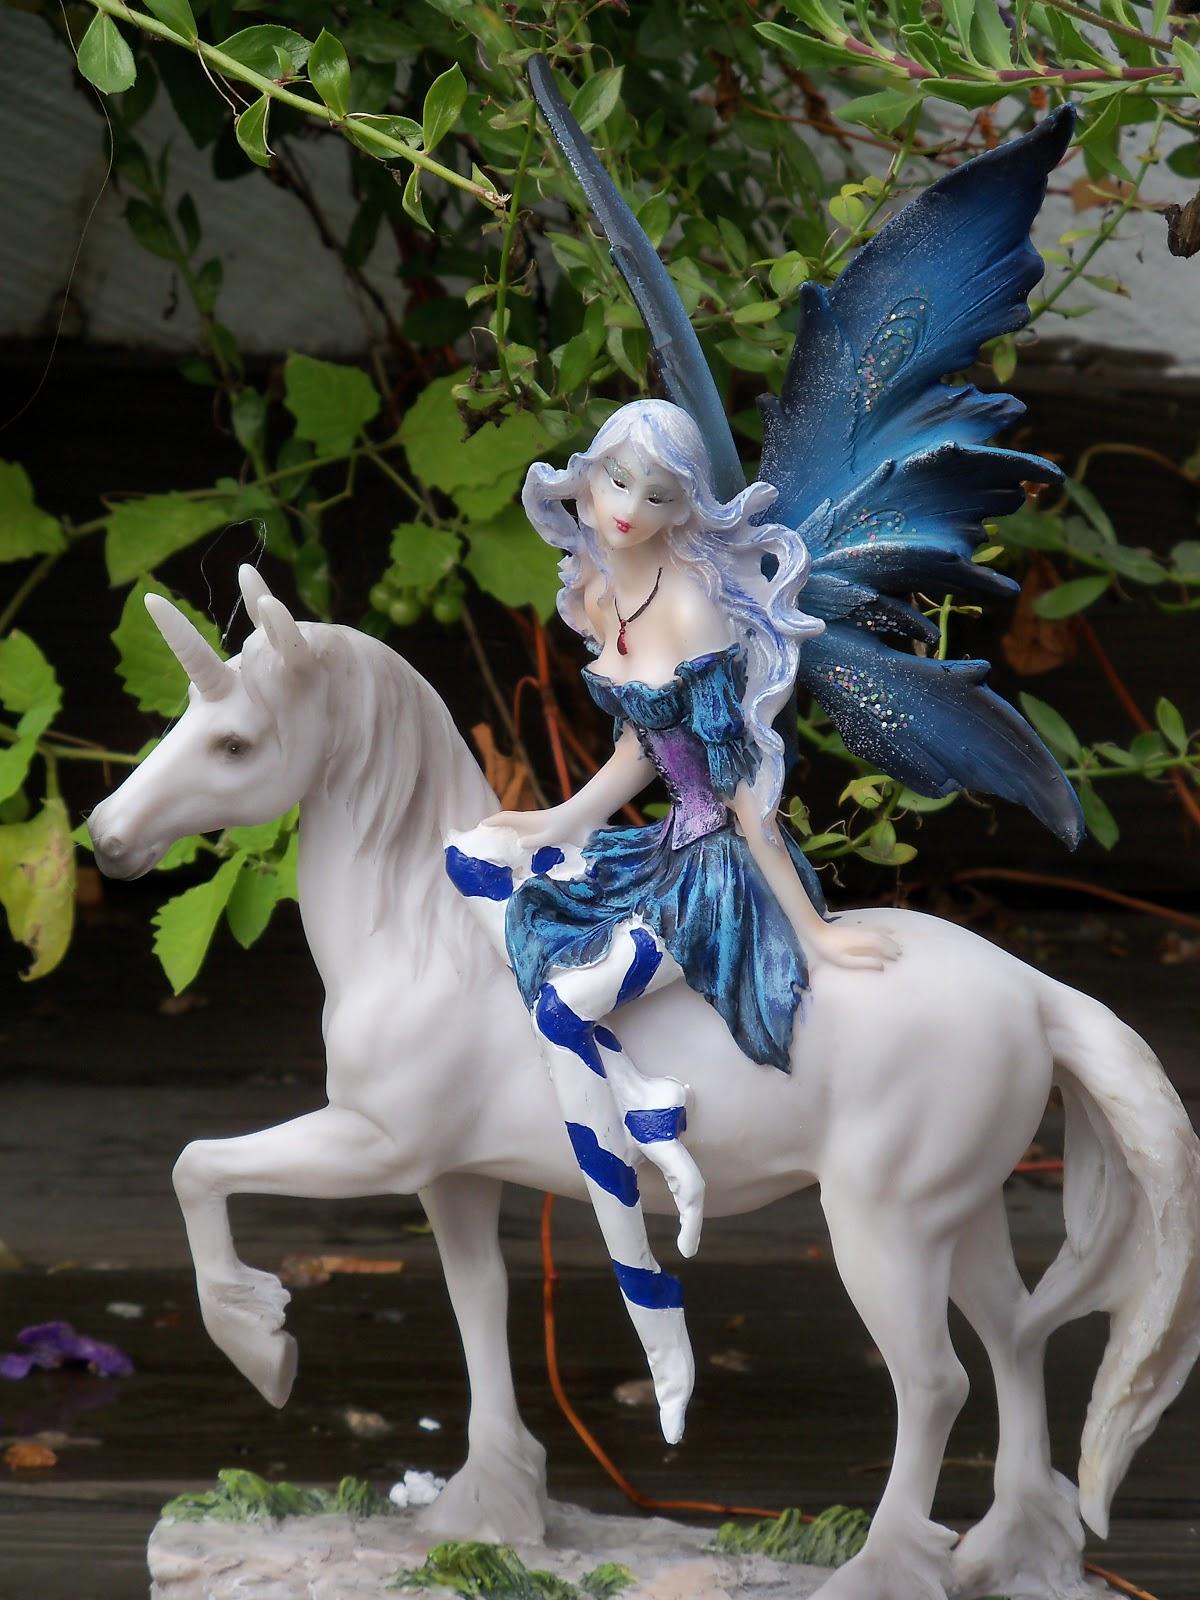 Silver Moon Adornments: Fairies, Angels & Mermaids